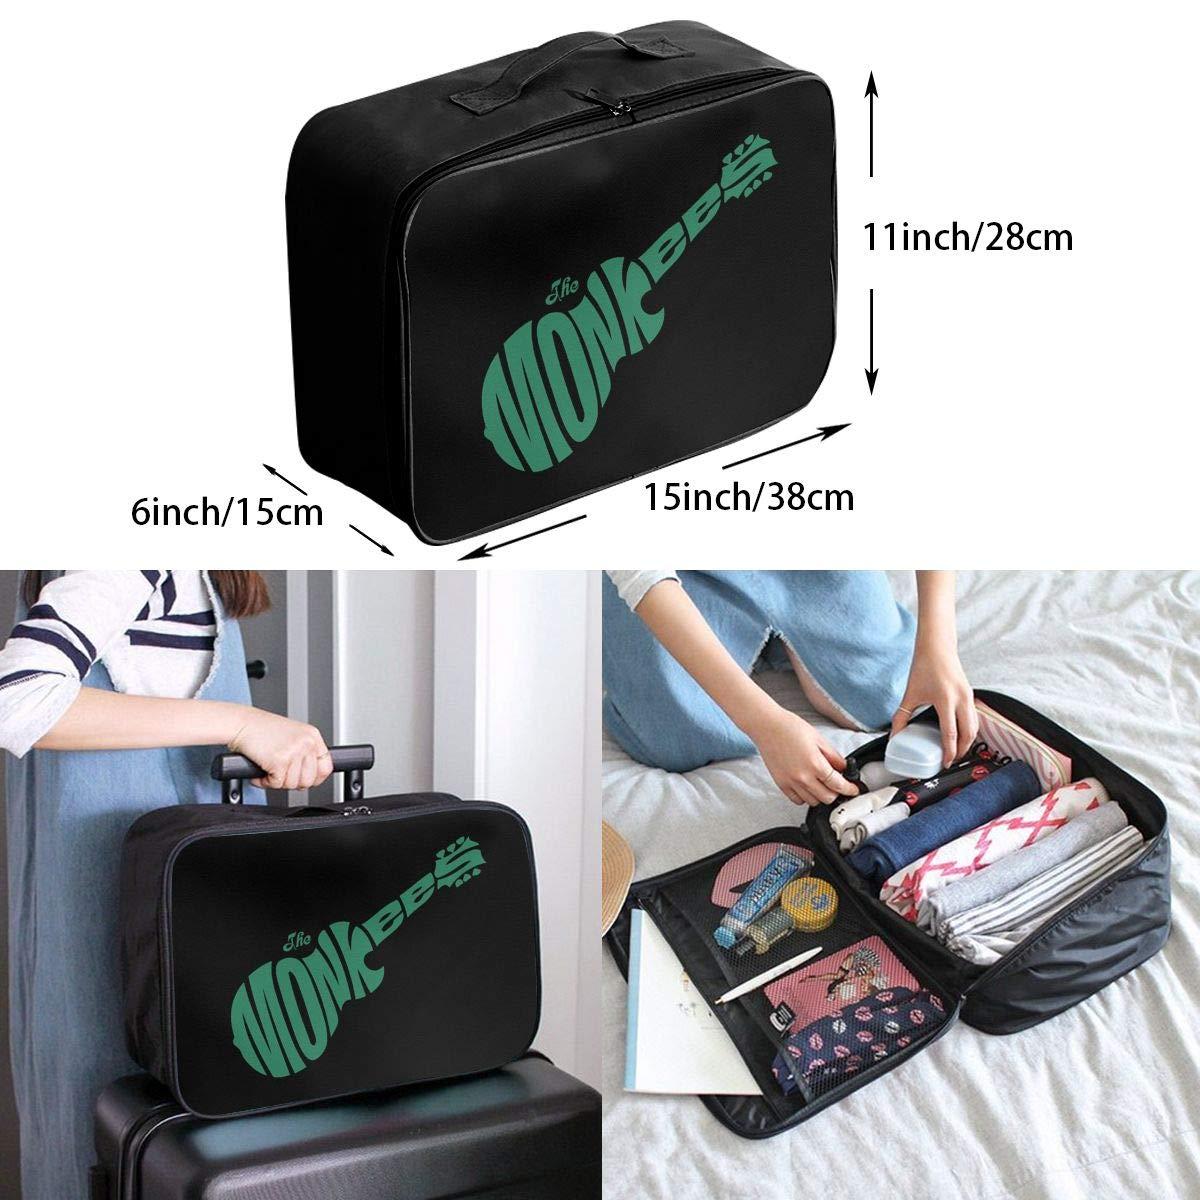 Fretlo The-Monkees-Guitar-Rock-Band-Logo Travel Duffel Bag Waterproof Lightweight Large Capacity Portable Luggage Bag Black